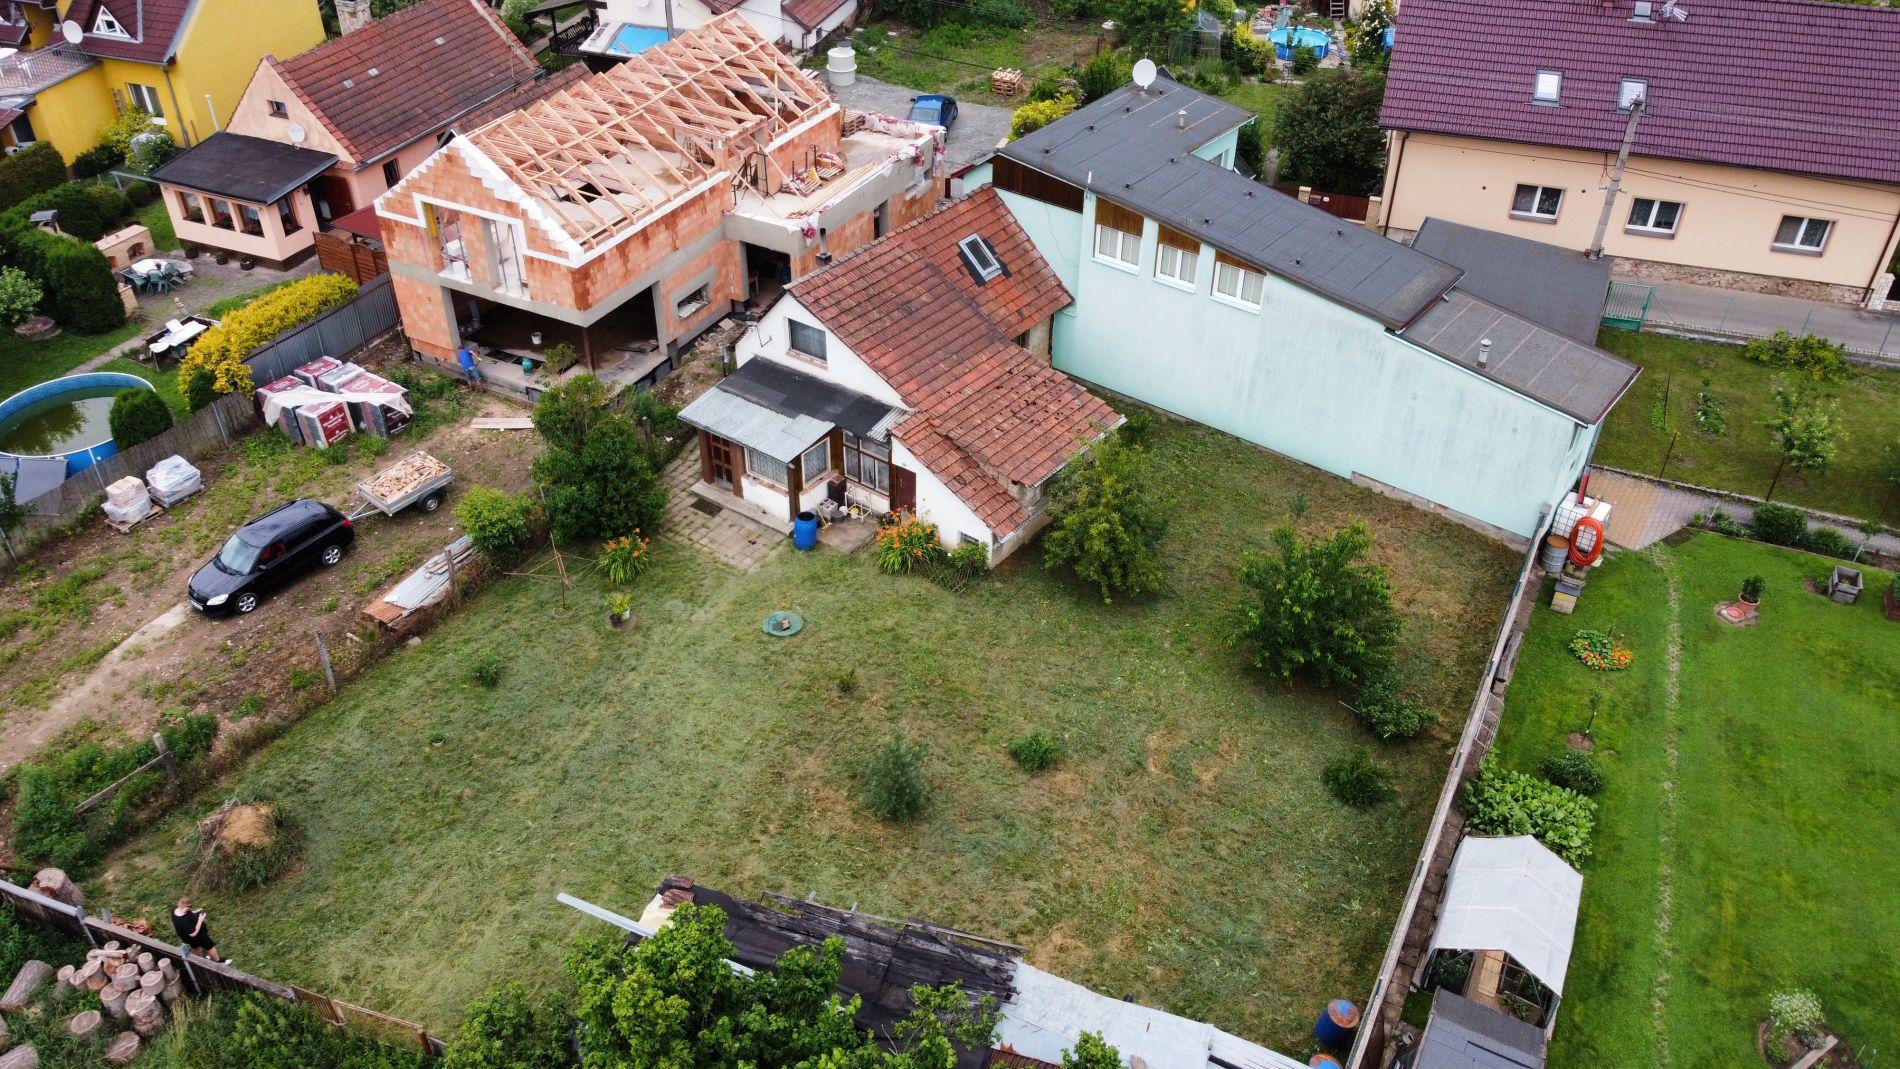 Prodej rodinného domu v obci Předklášteří, Brno - venkov